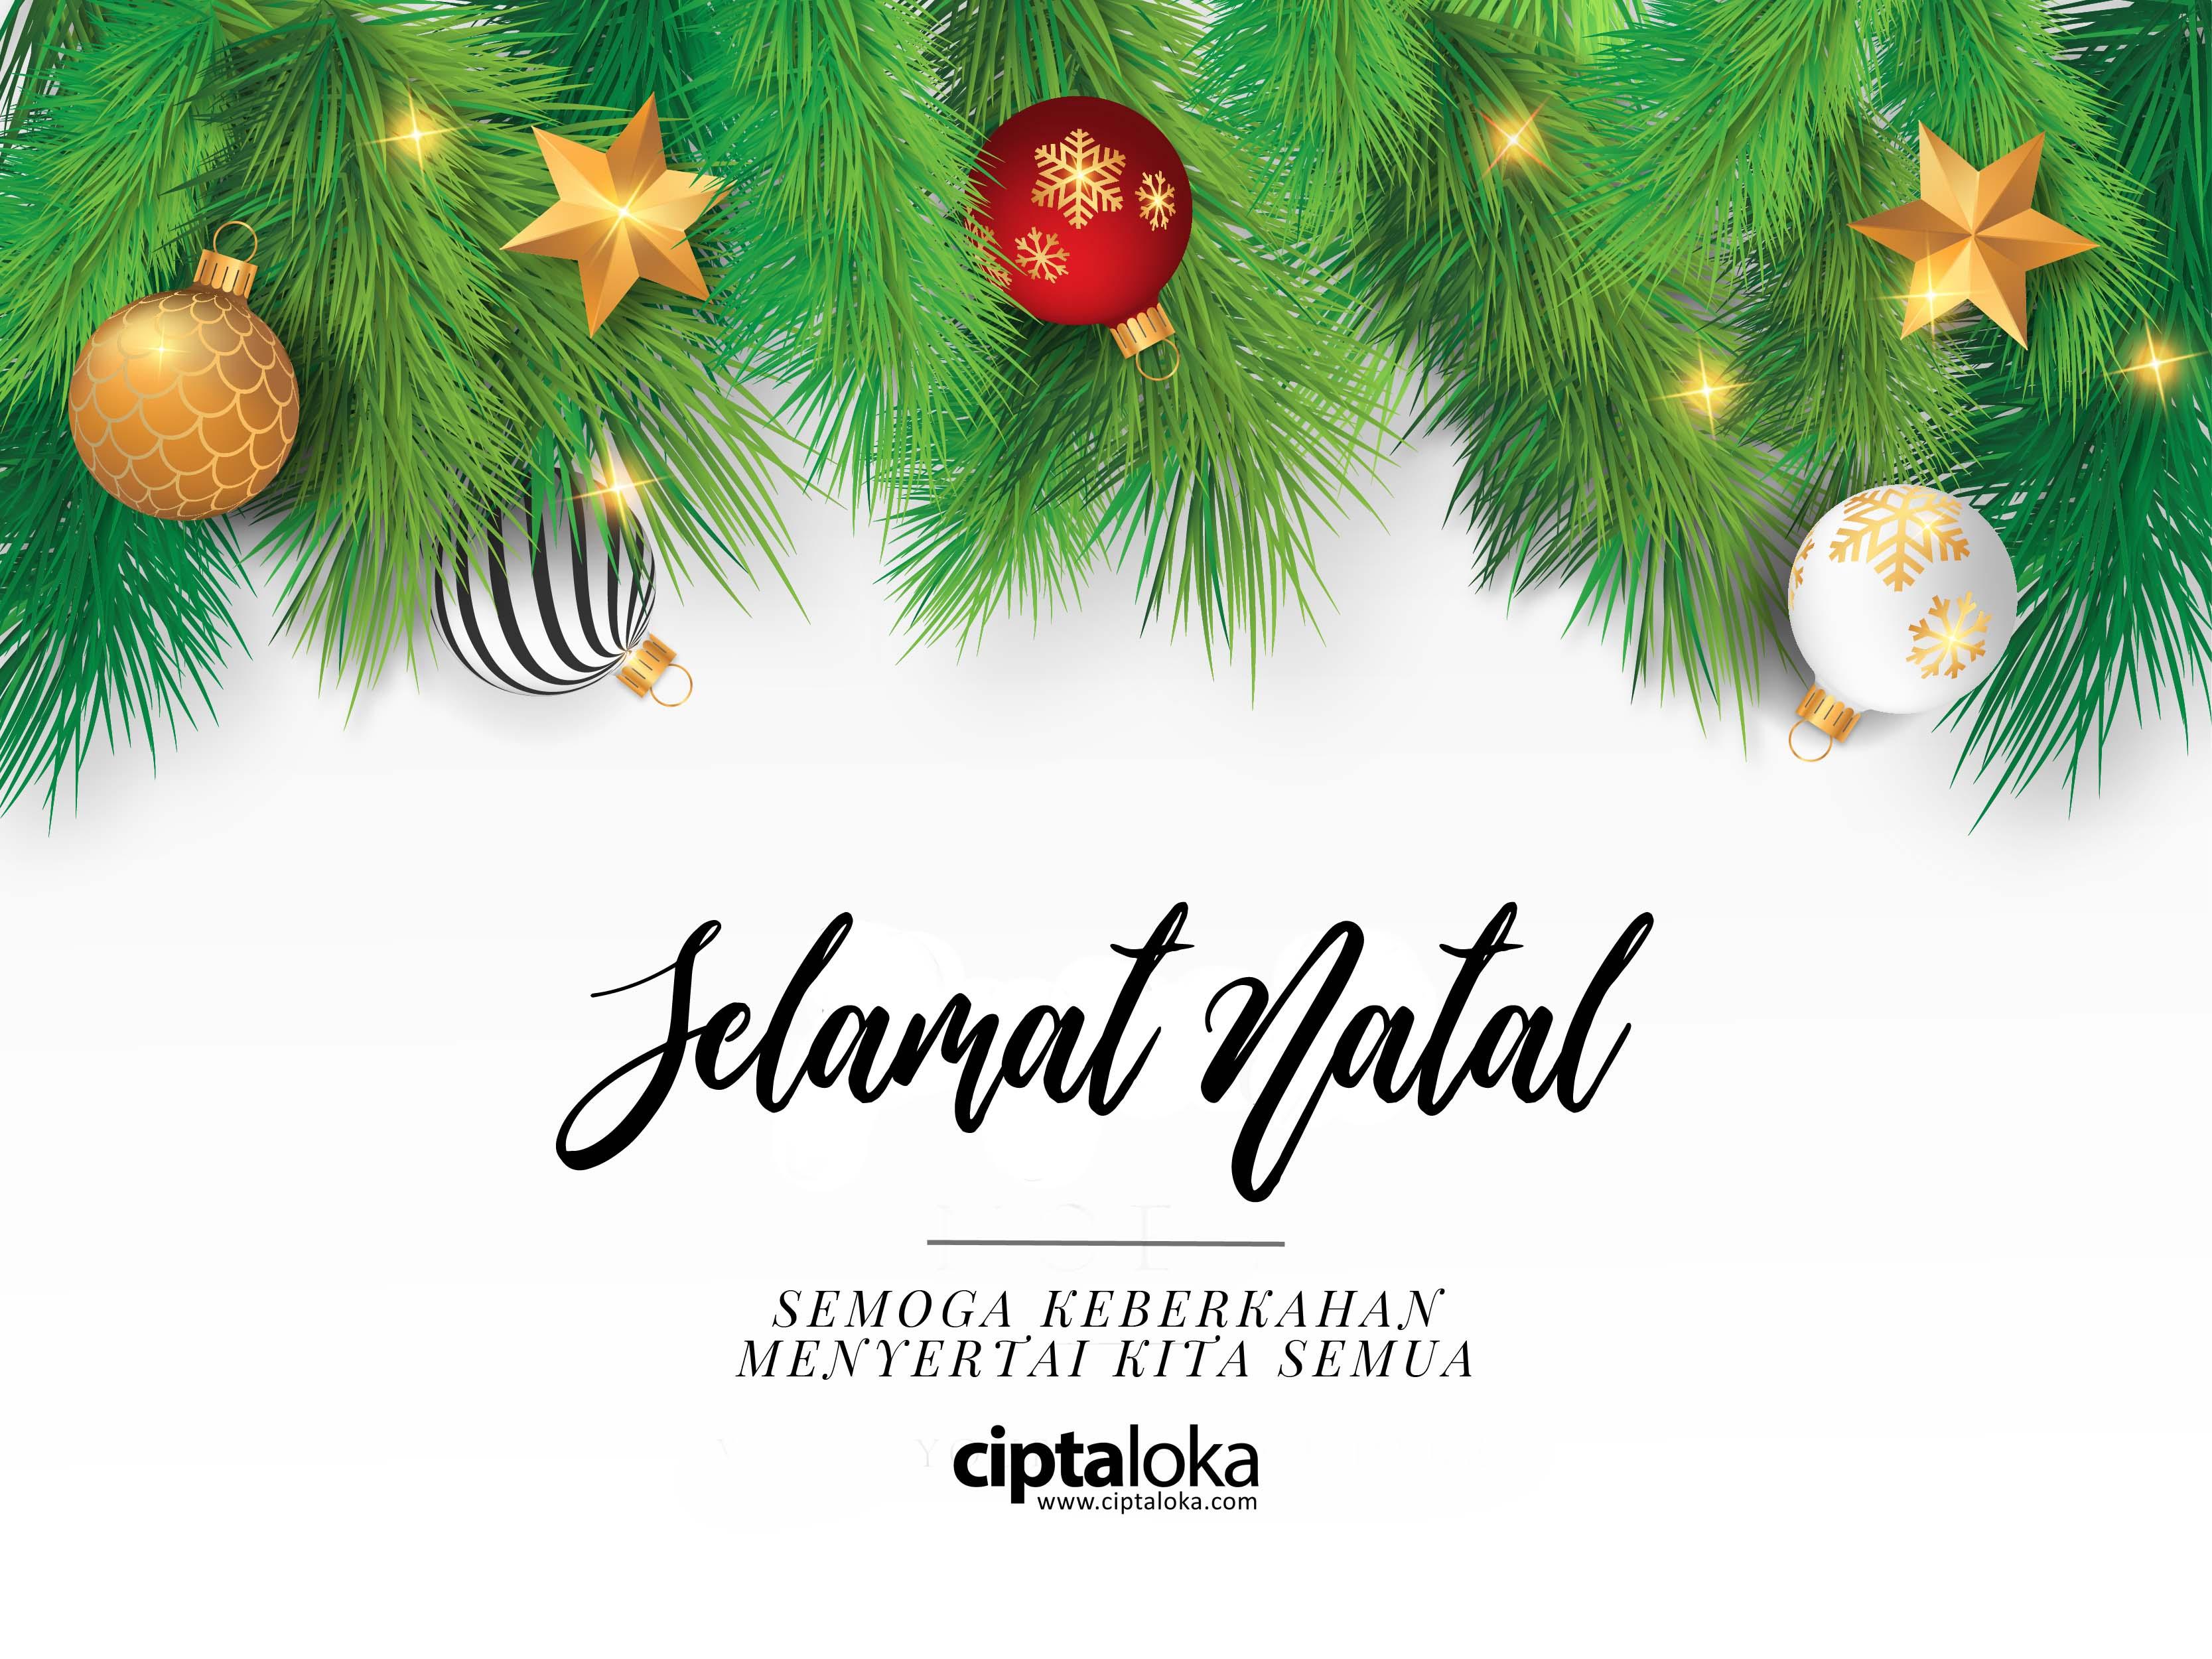 Gambar Dan Ucapan Selamat Natal Cocok Untuk Social Media